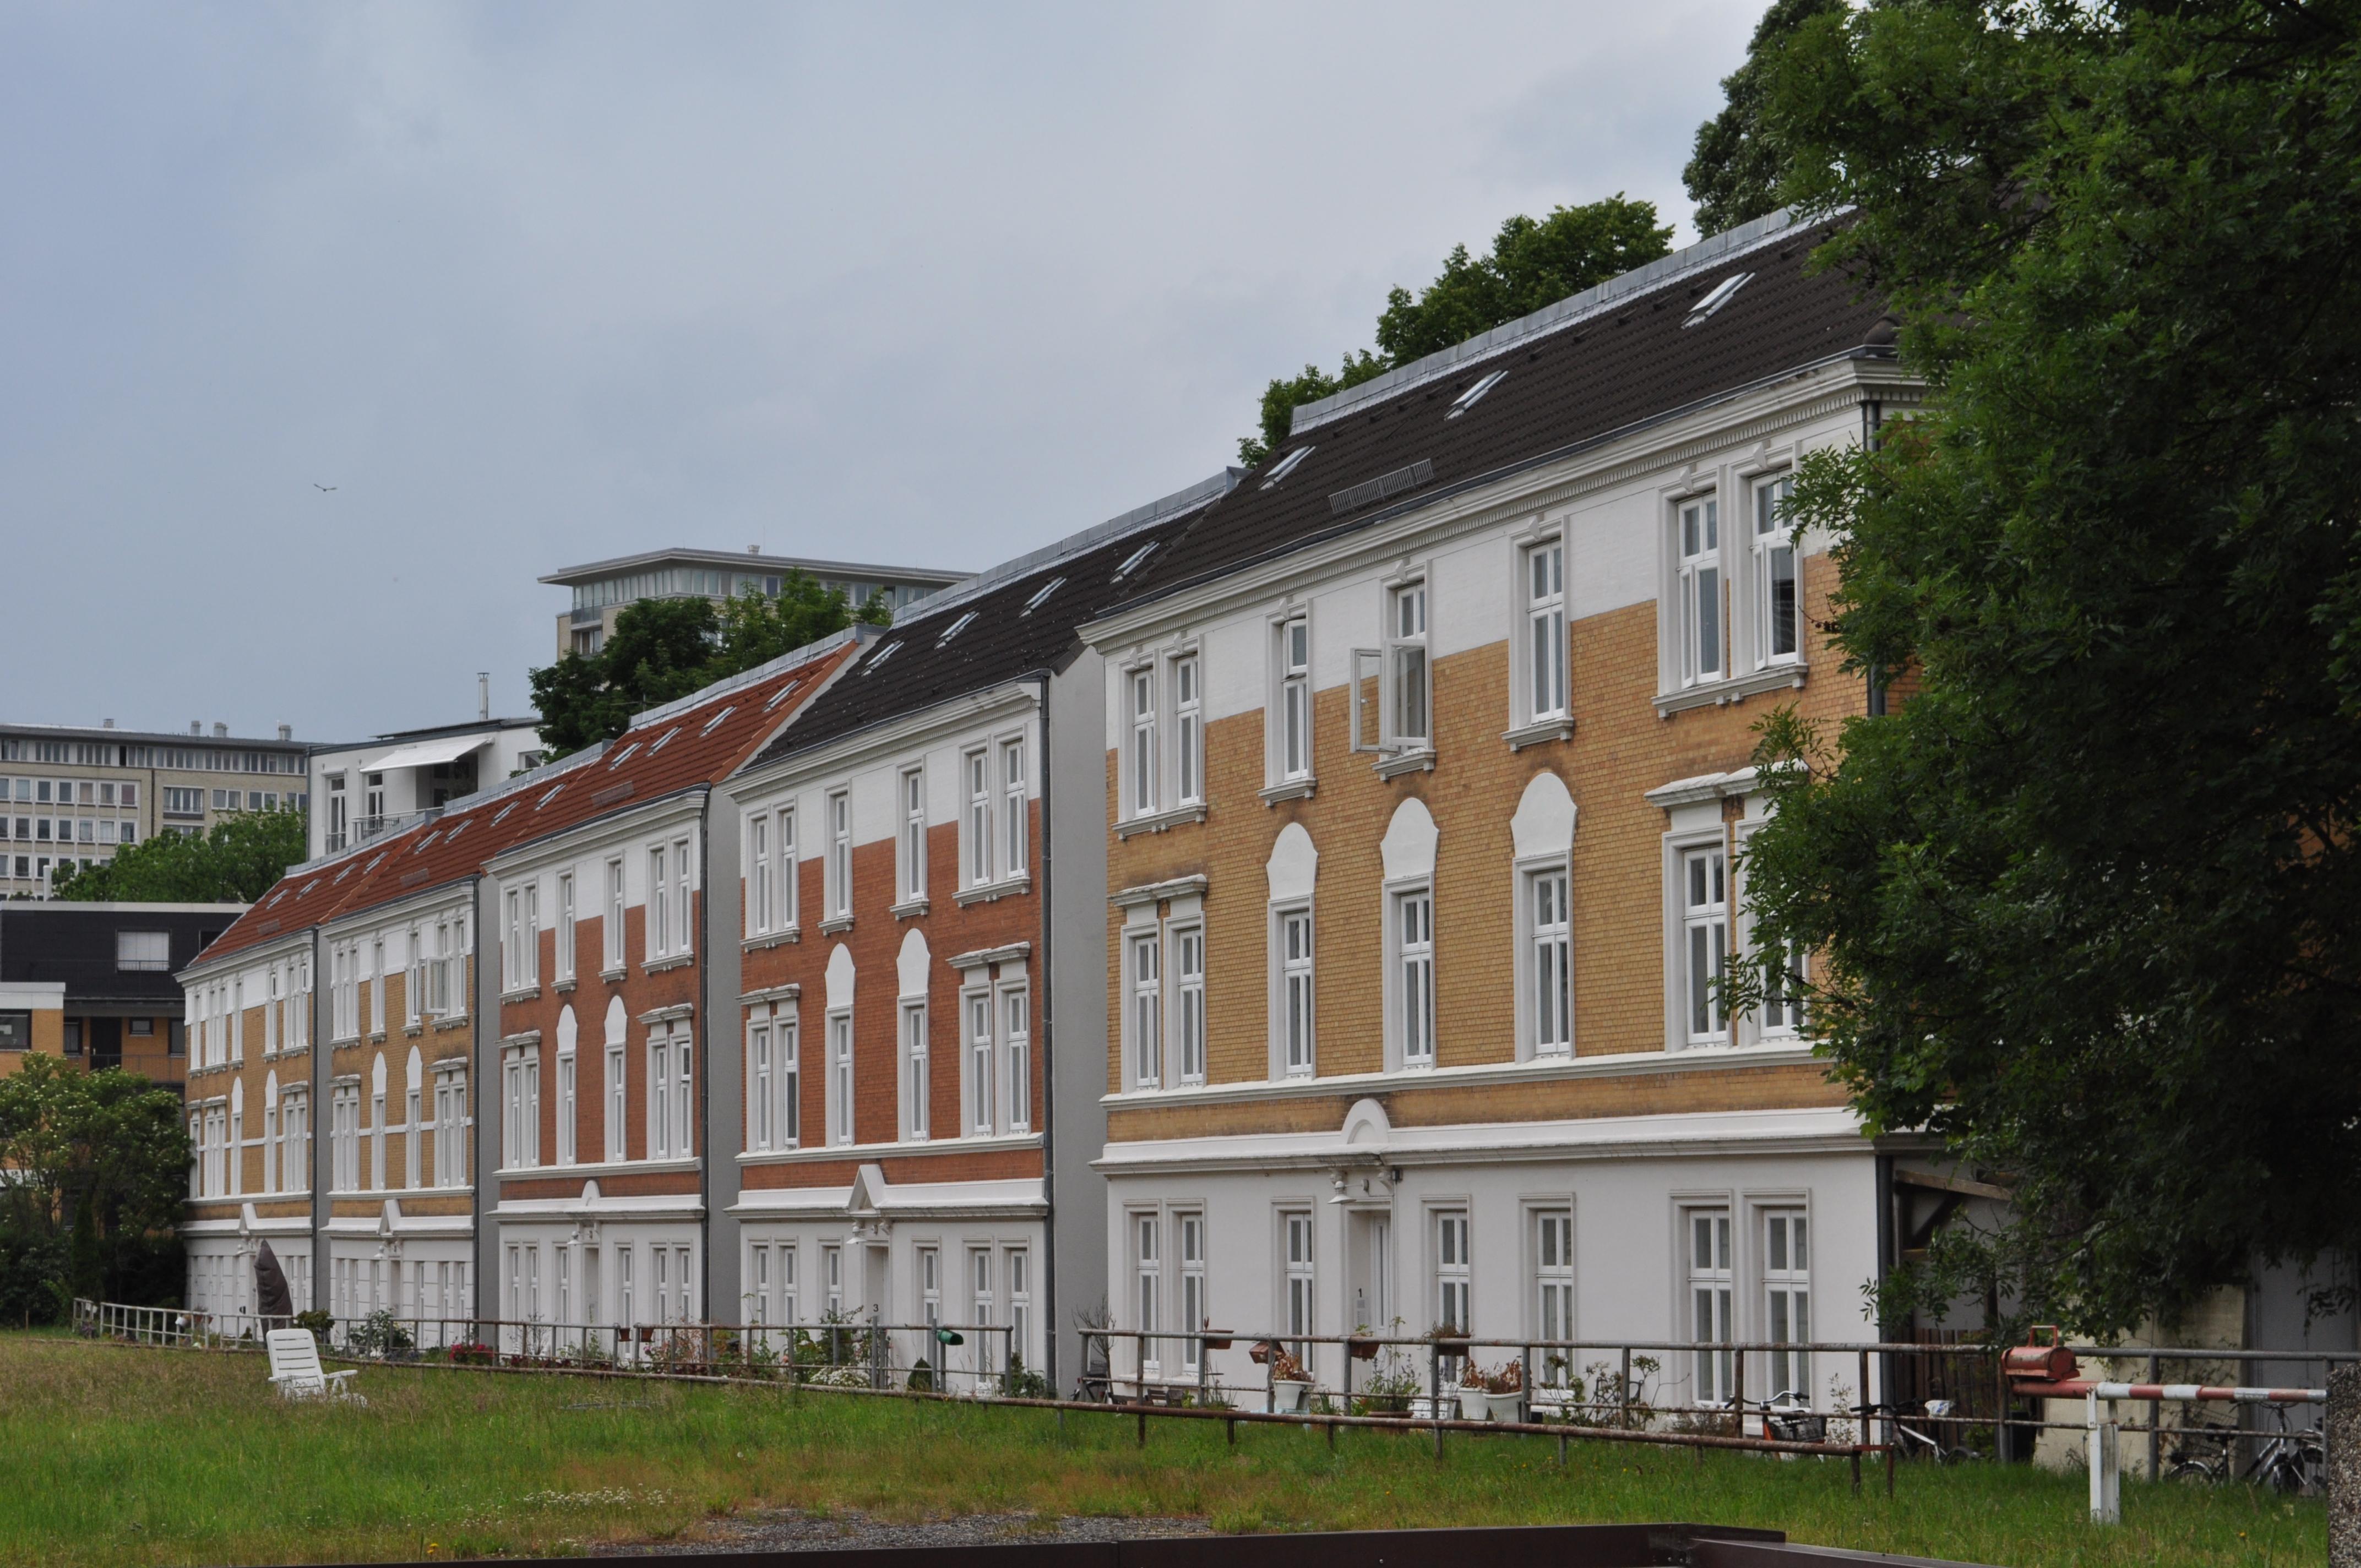 Datei:Grindelhof 89, Häuser 1-9 (Hamburg-Rotherbaum).ajb.jpg – Wikipedia